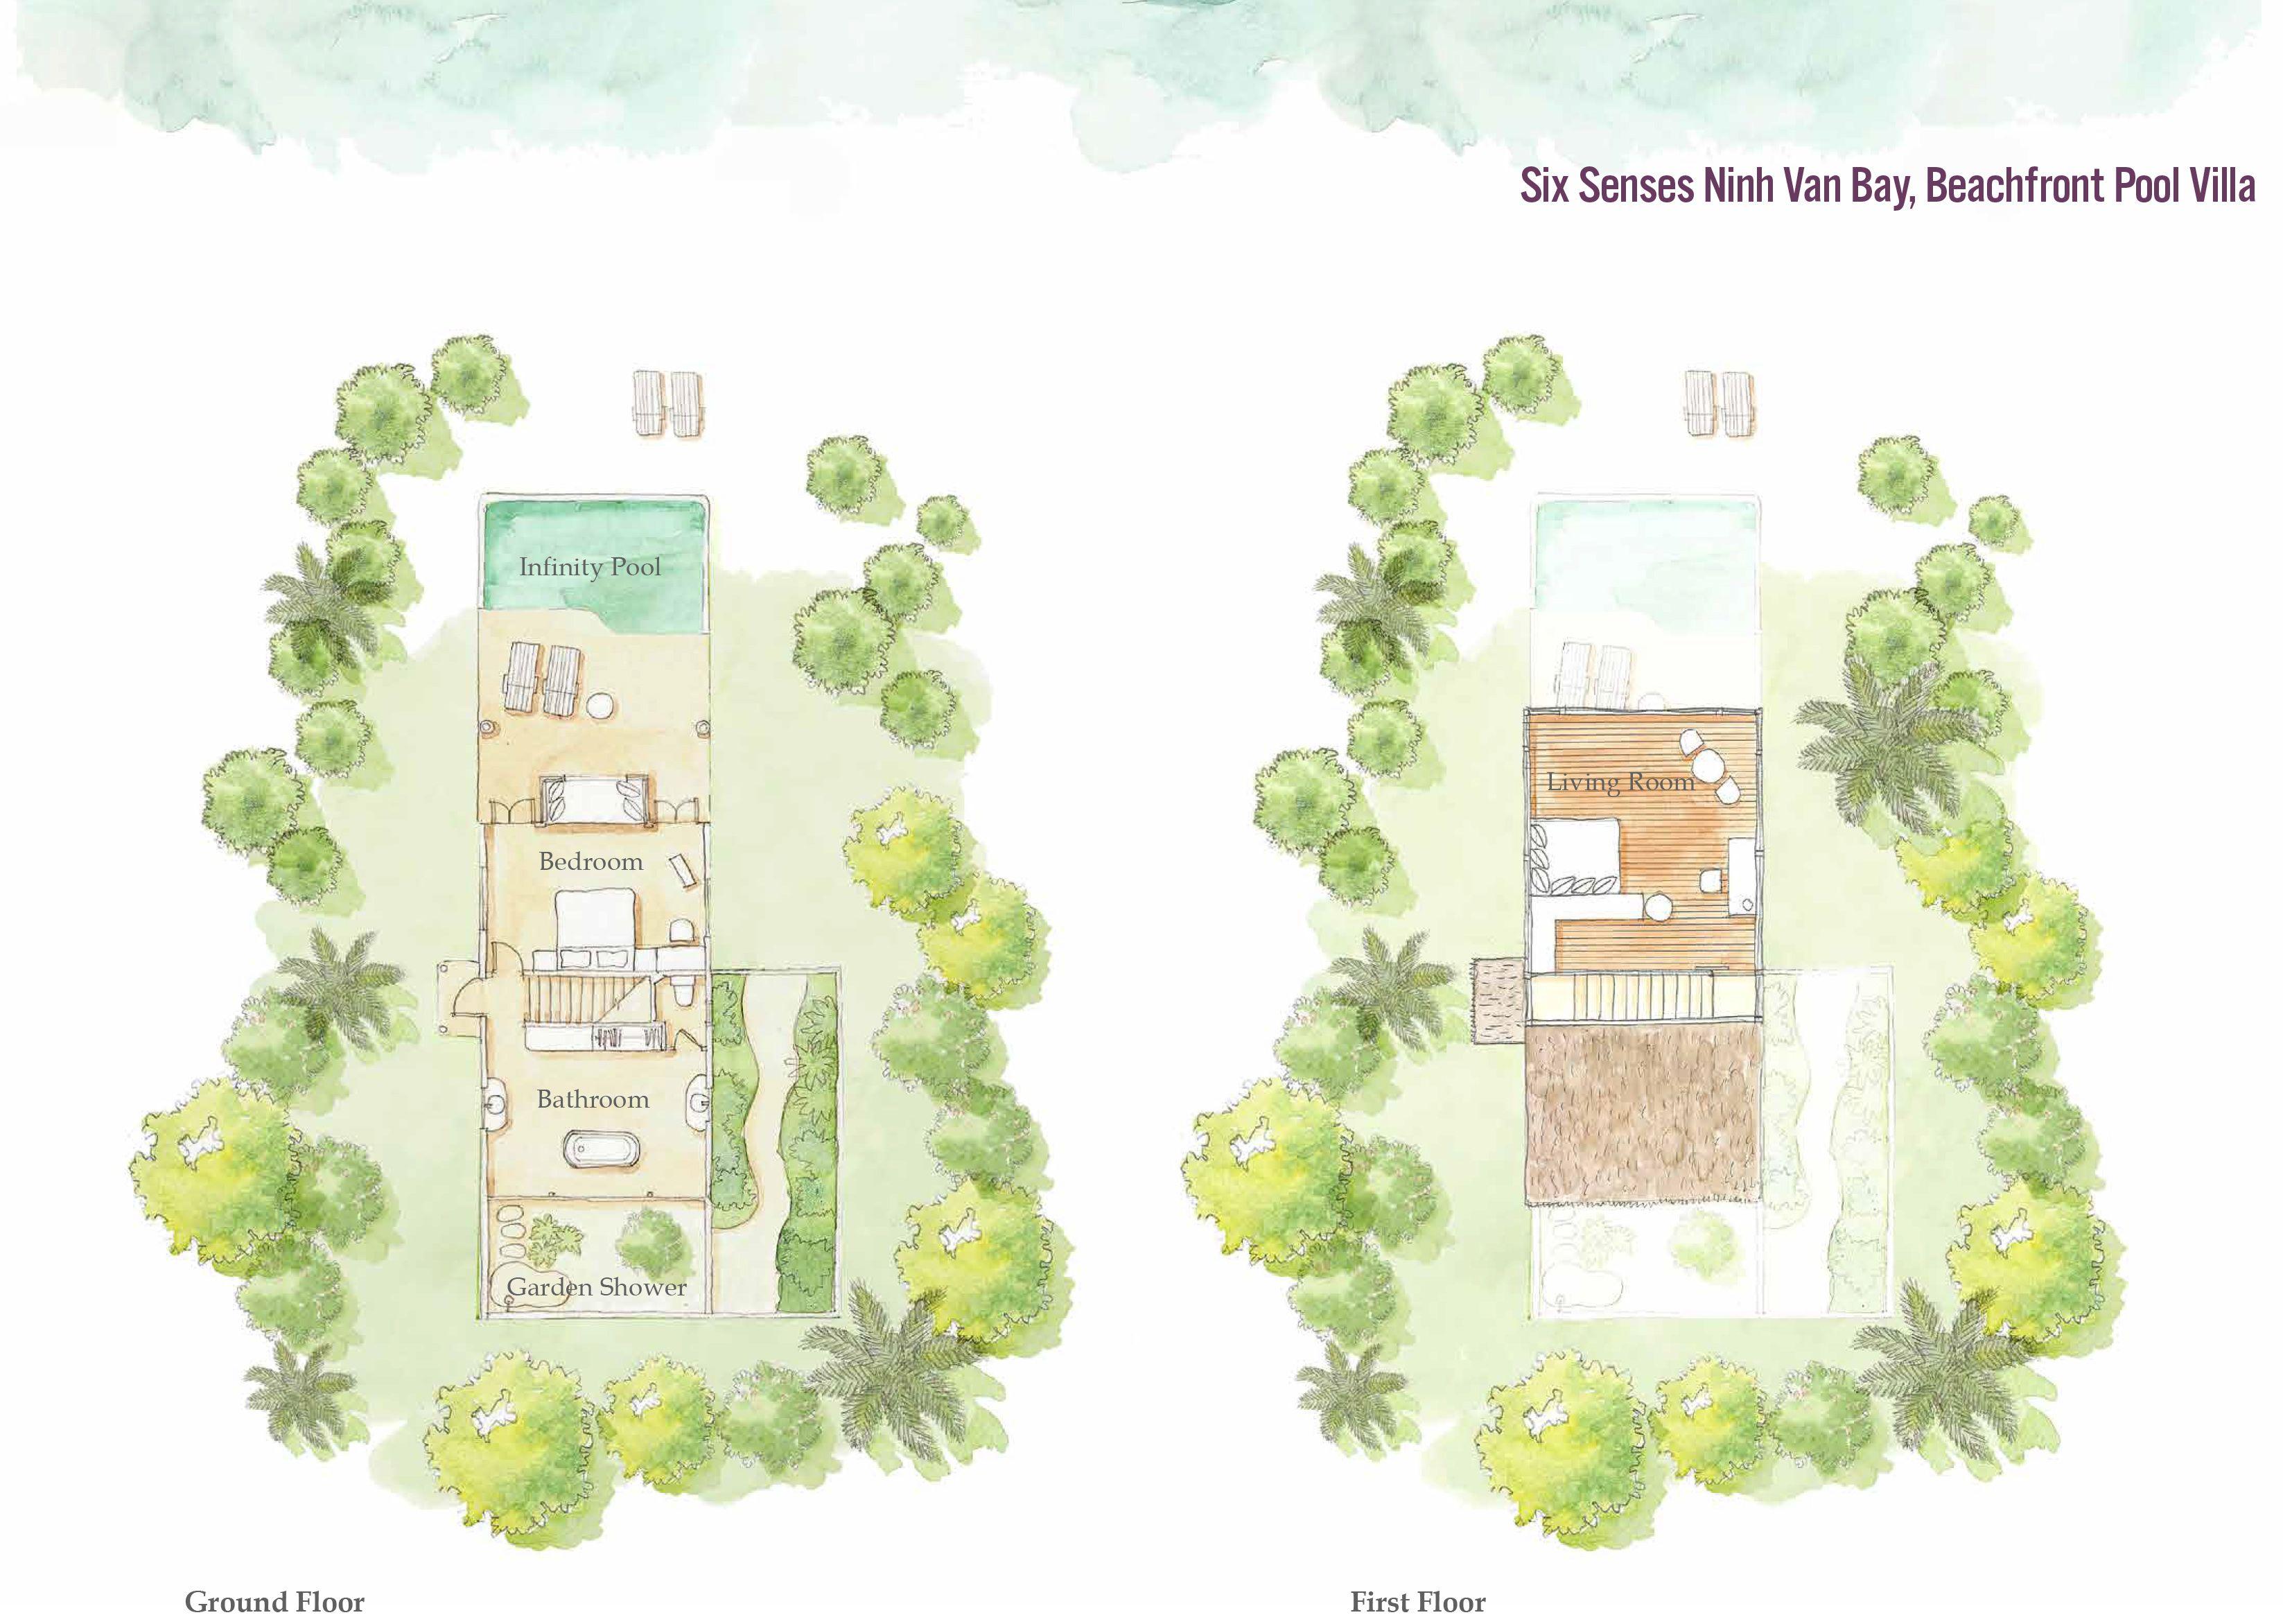 Six Senses Ninh Van Bay Beachfront Pool Villa フロア